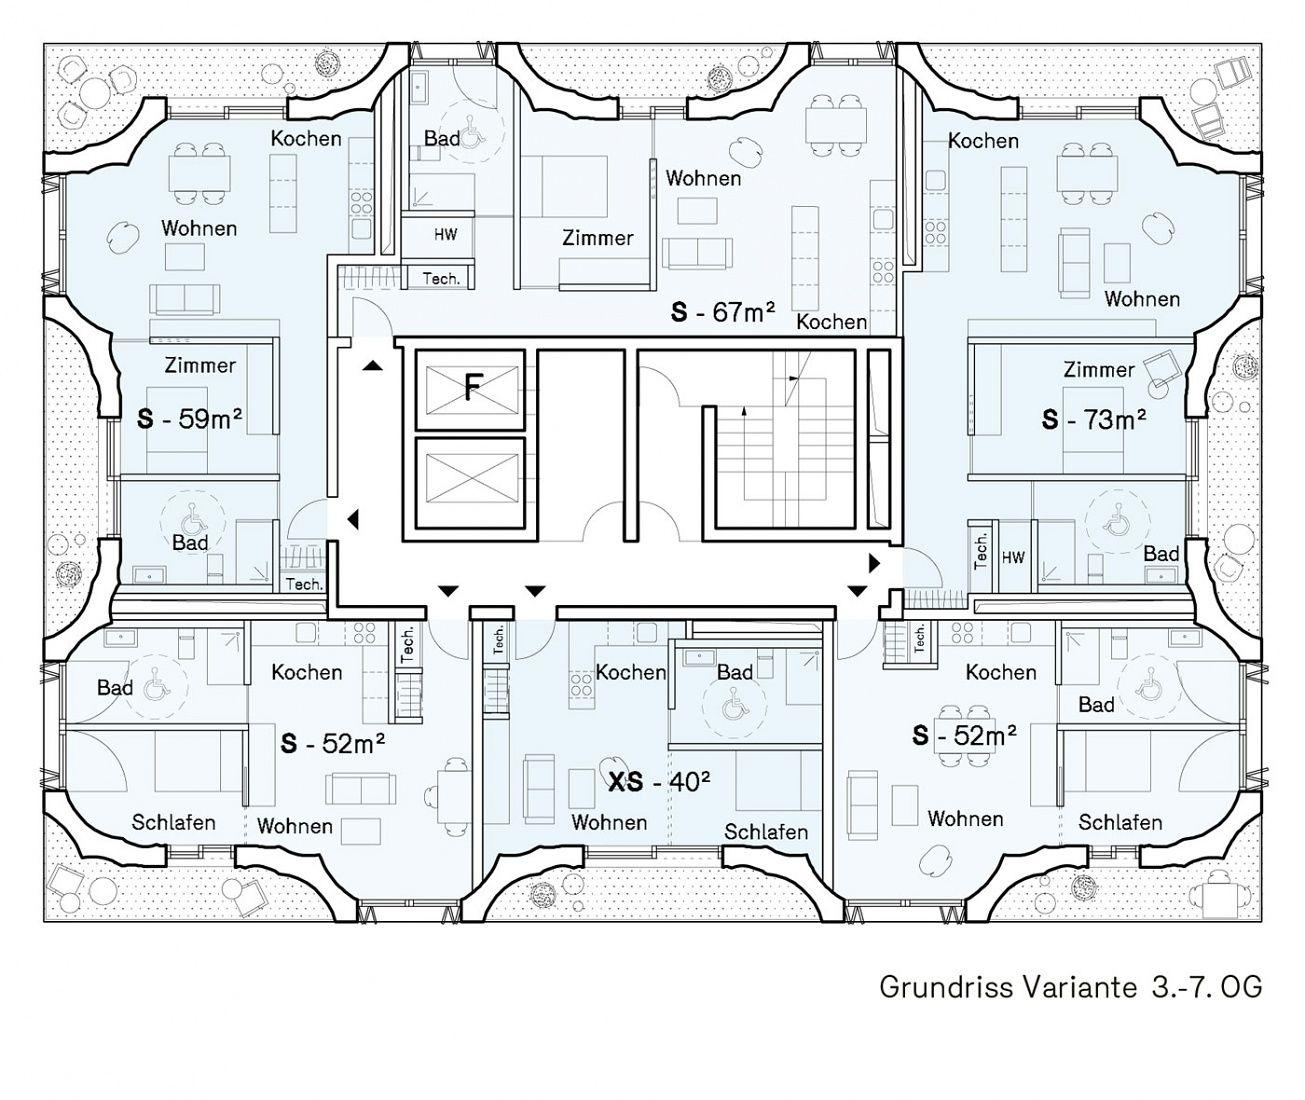 Villa tugendhat arkitalker mies van der rohe - Urban